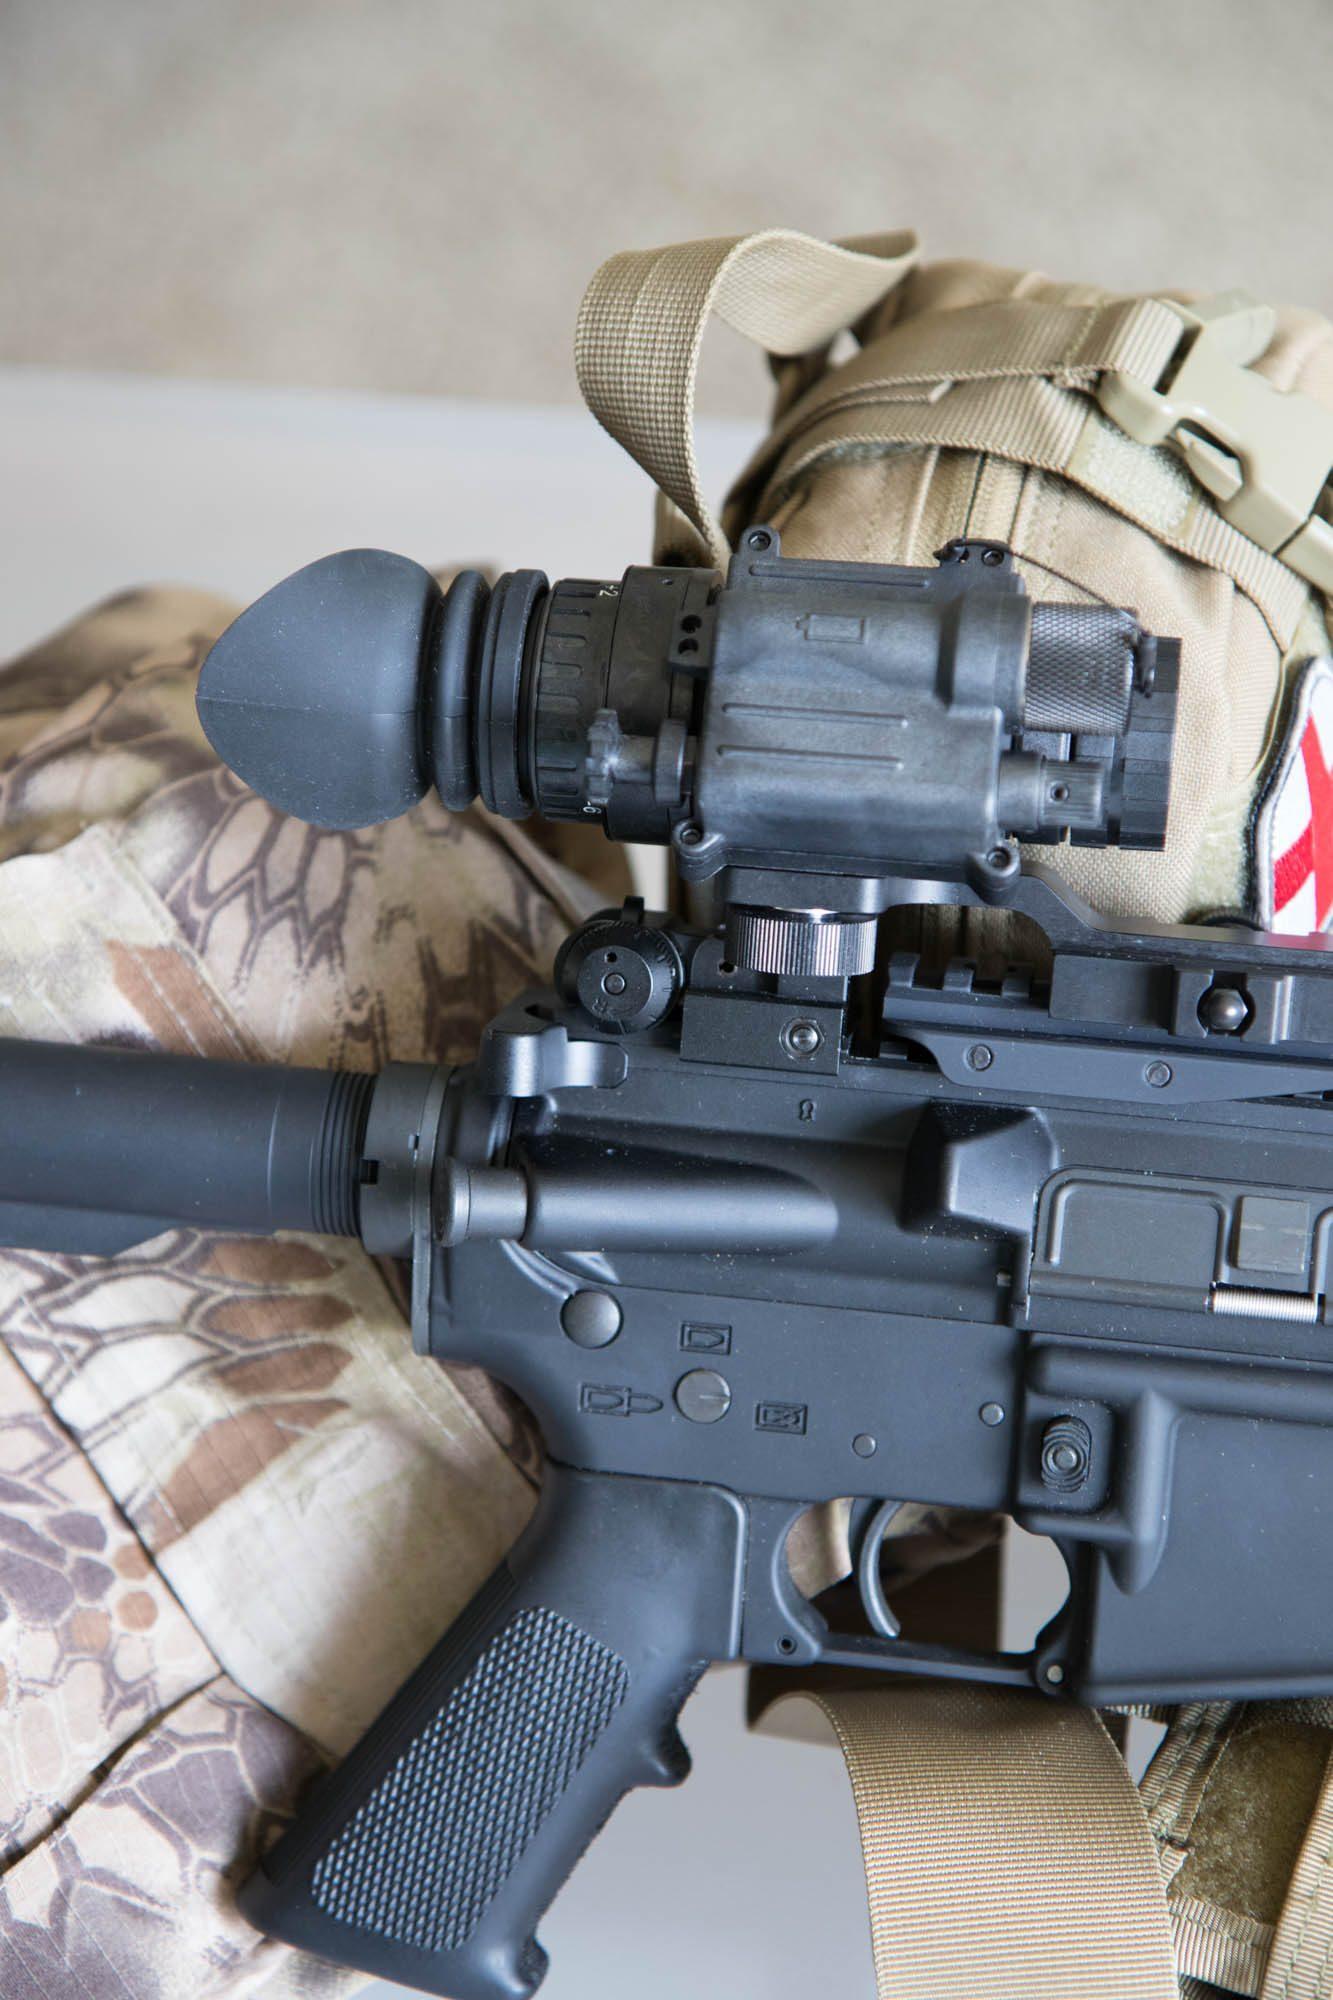 PVS-14 Mounted on AR-15